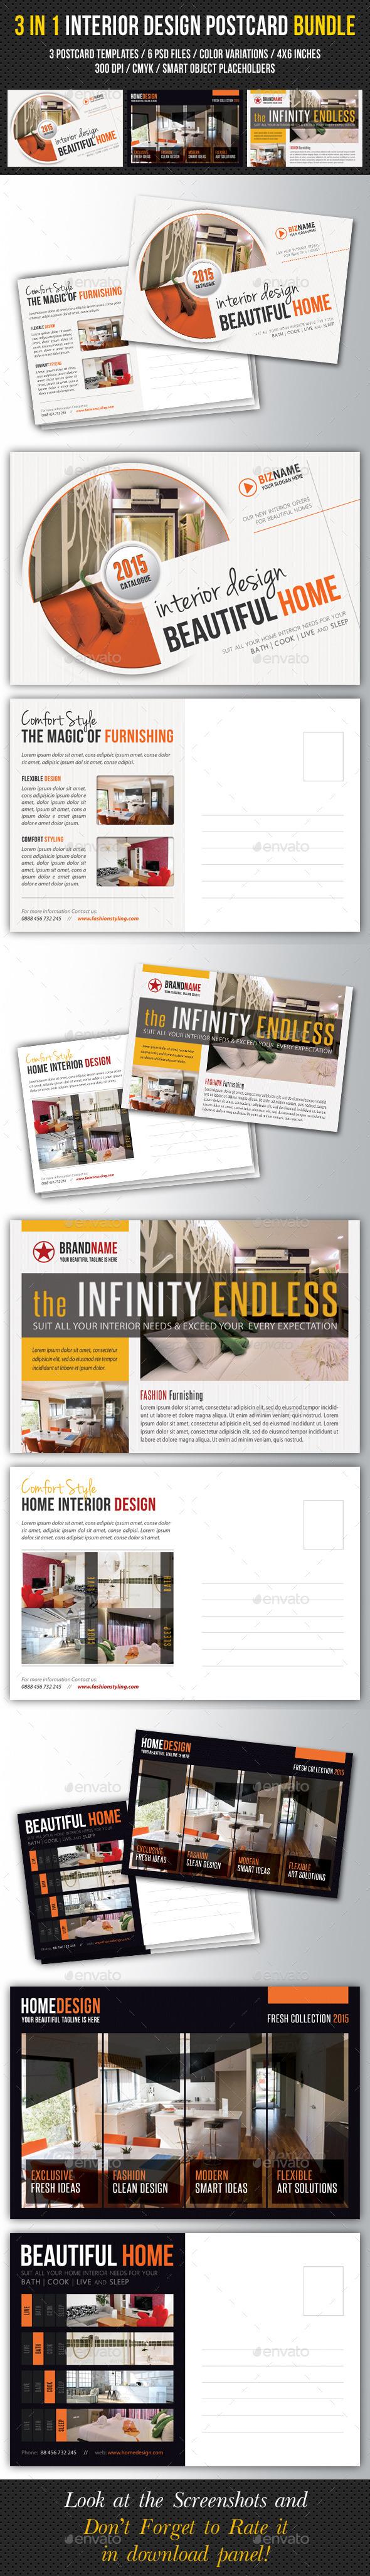 3 in 1 Interior Design Postcard Template Bundle 01 - Cards & Invites Print Templates